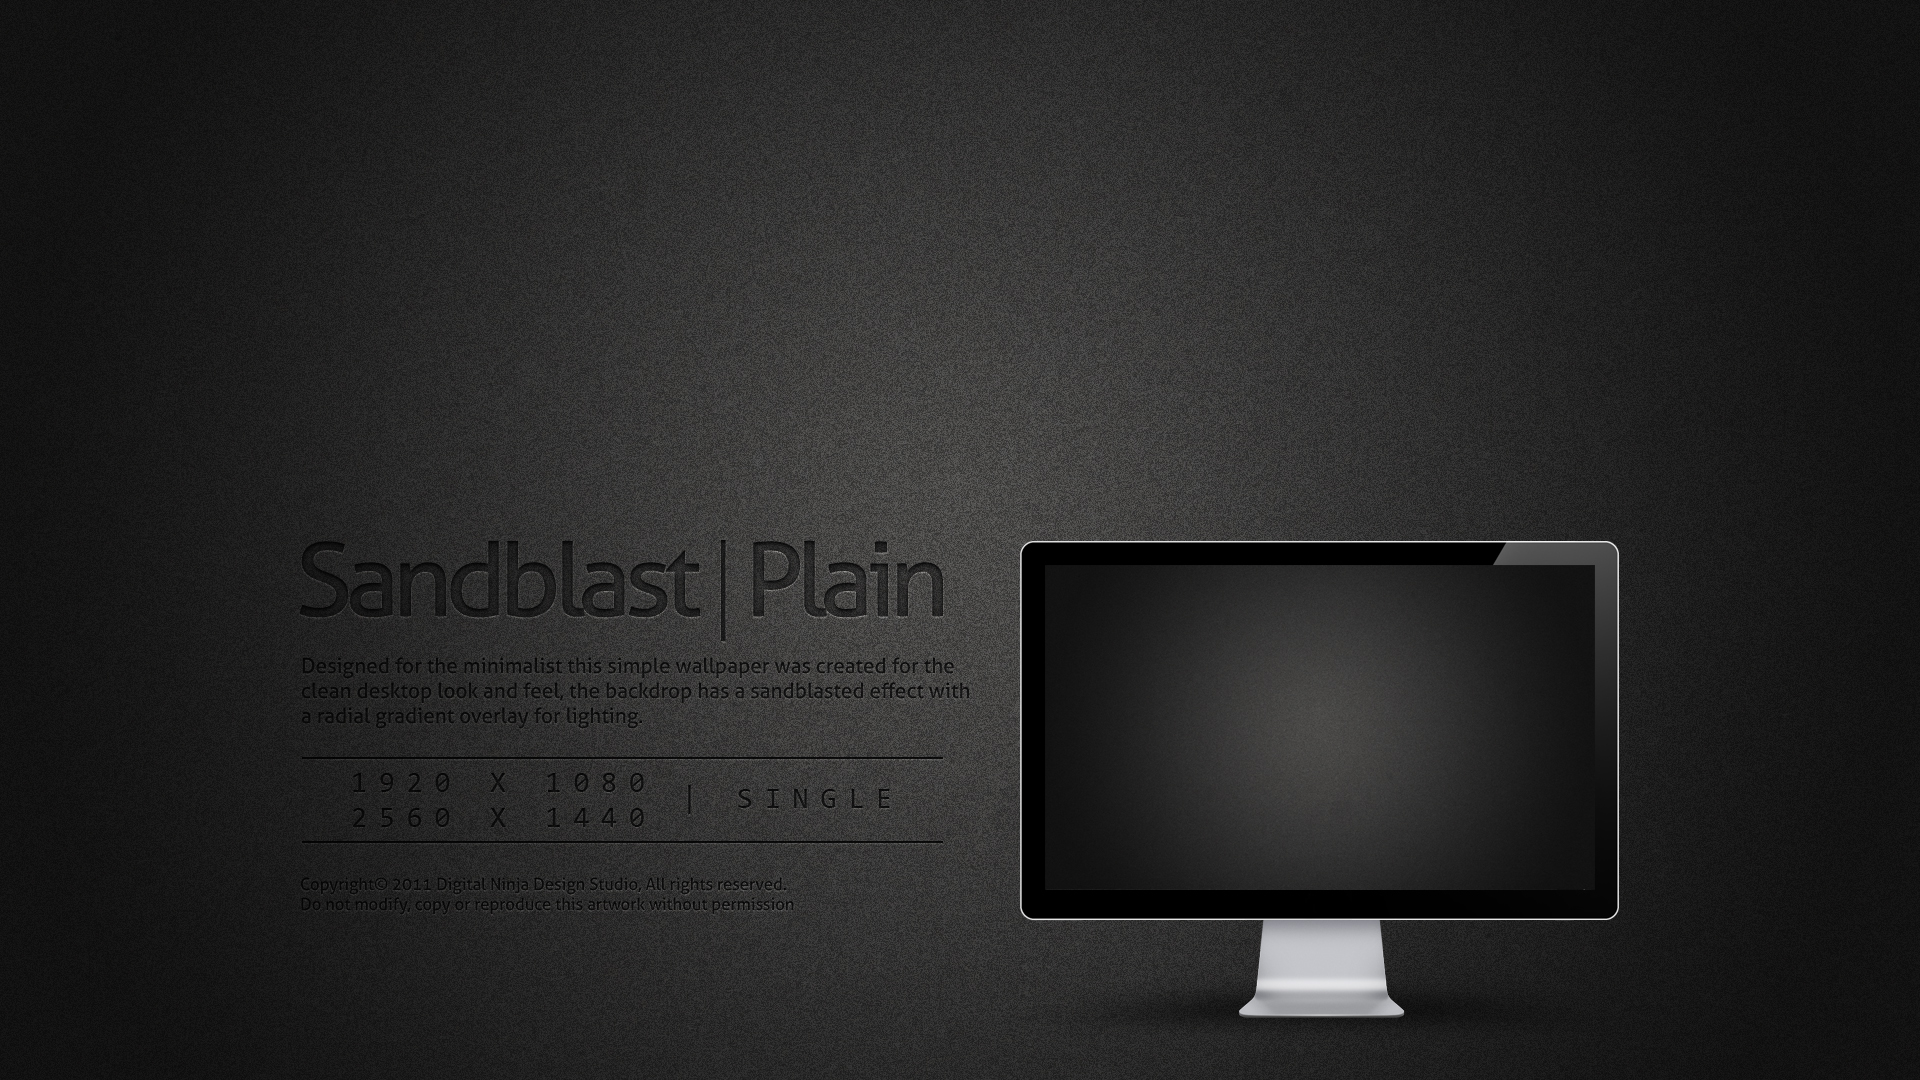 Sandblast Plain S1 by DNStudios